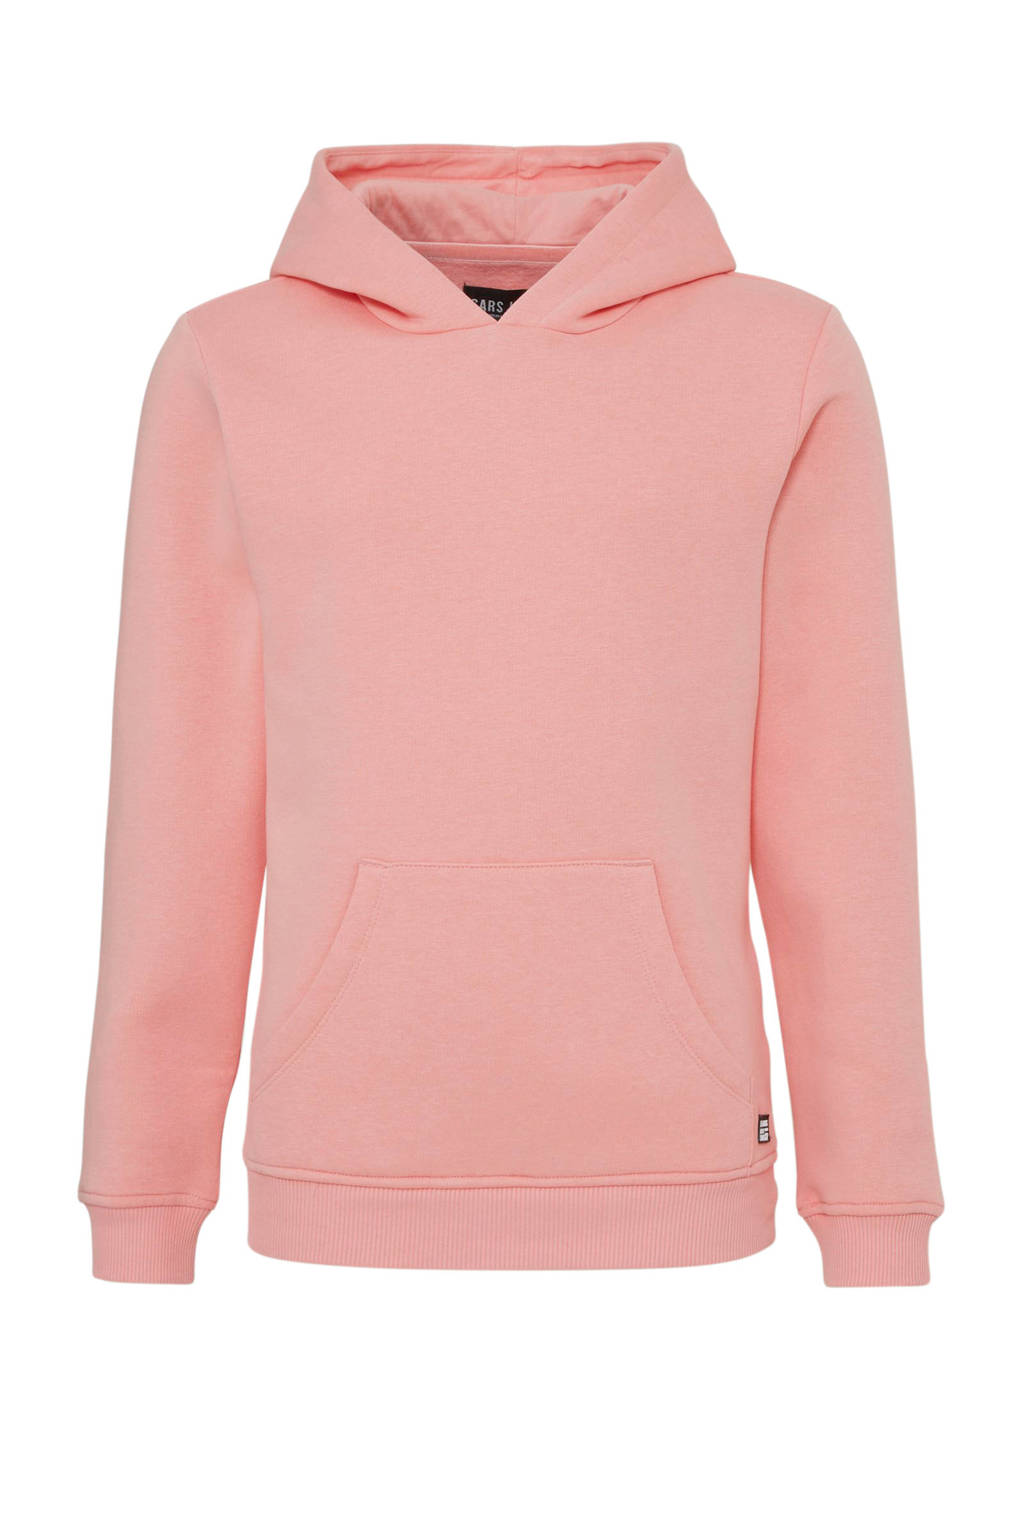 Cars hoodie Kimar roze, Roze